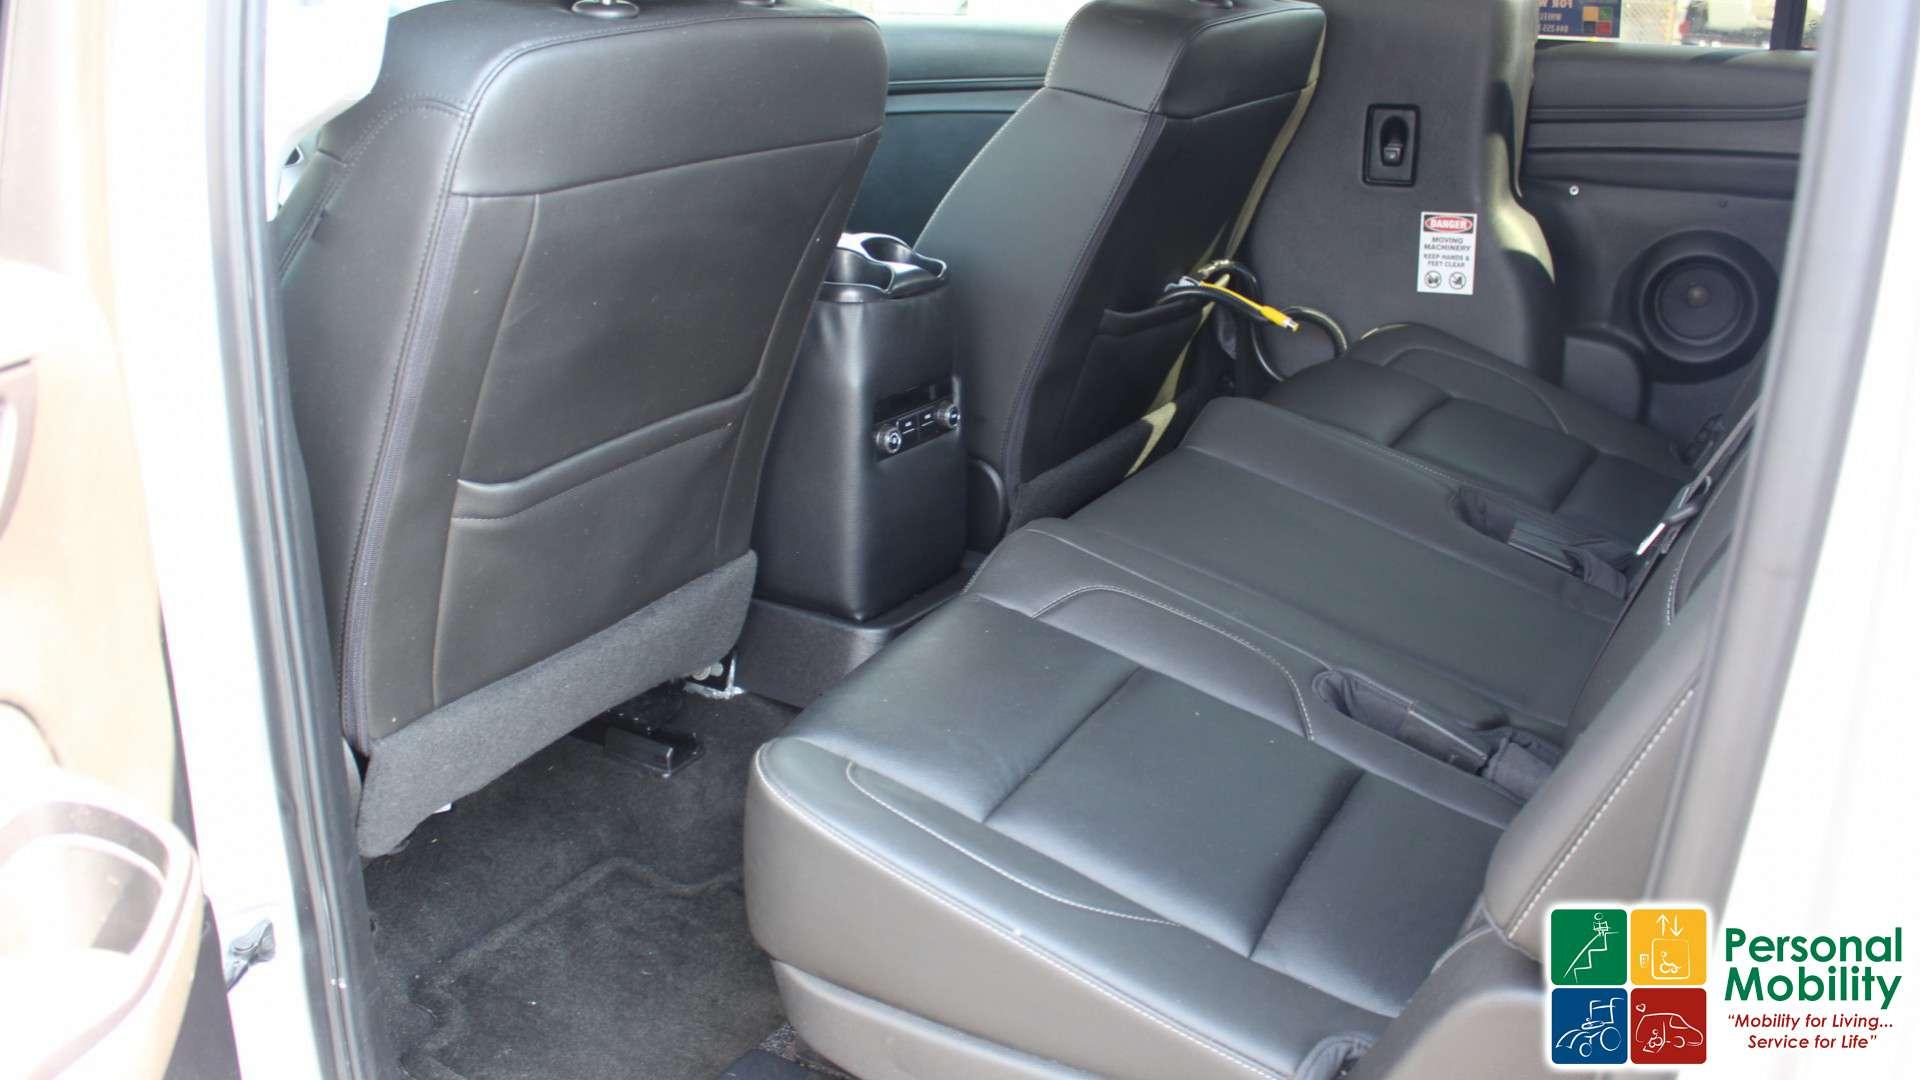 2016 Chevrolet Suburban | Stock: GR189338 | Wheelchair Van For Sale